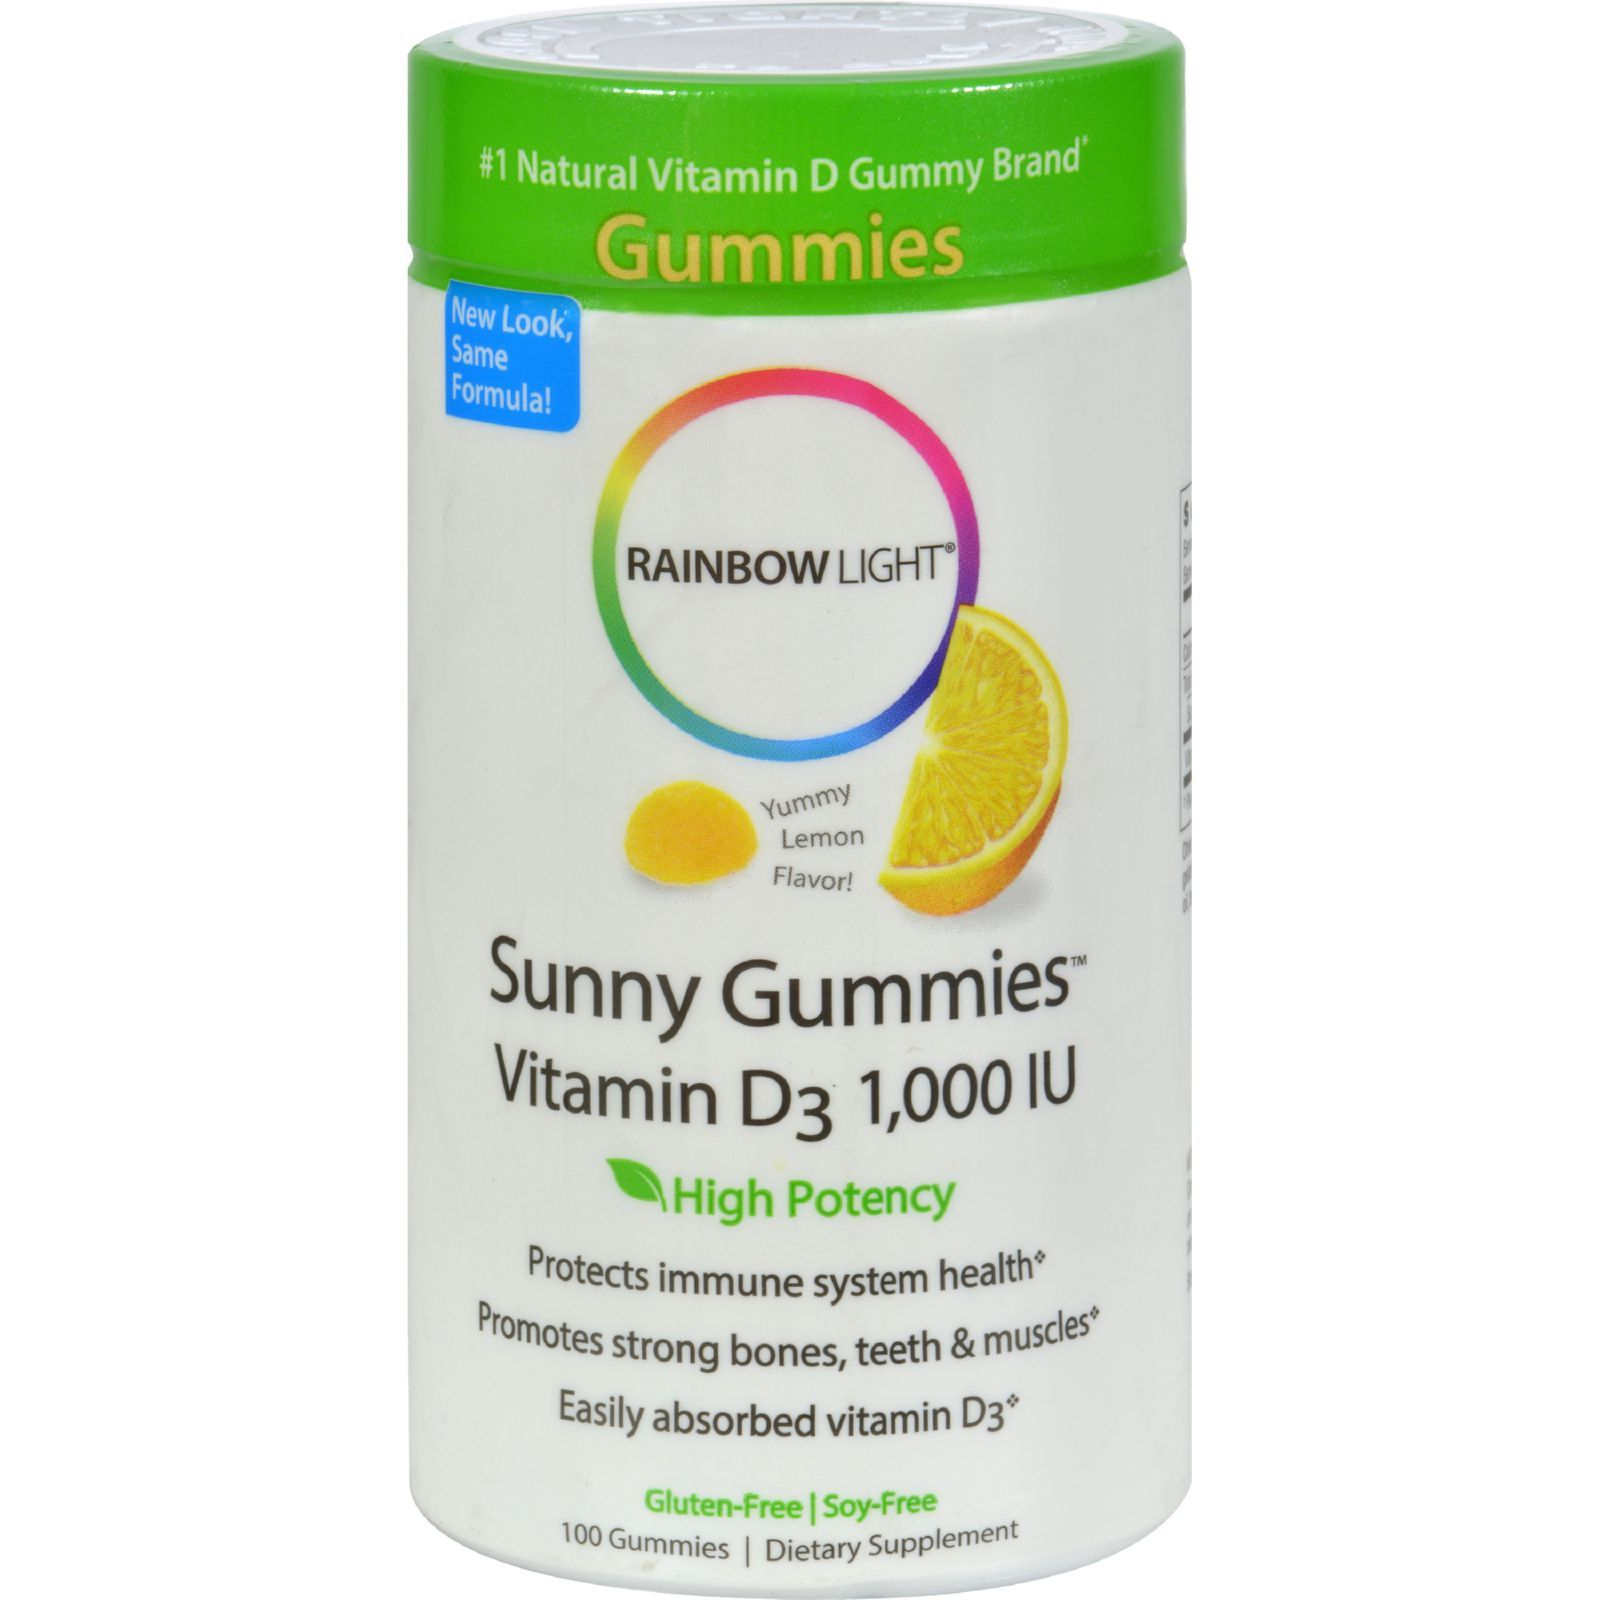 Rainbow Light Vitamin D Sunny Gummies Sour Lemon - 1000 IU - 100 Gummies